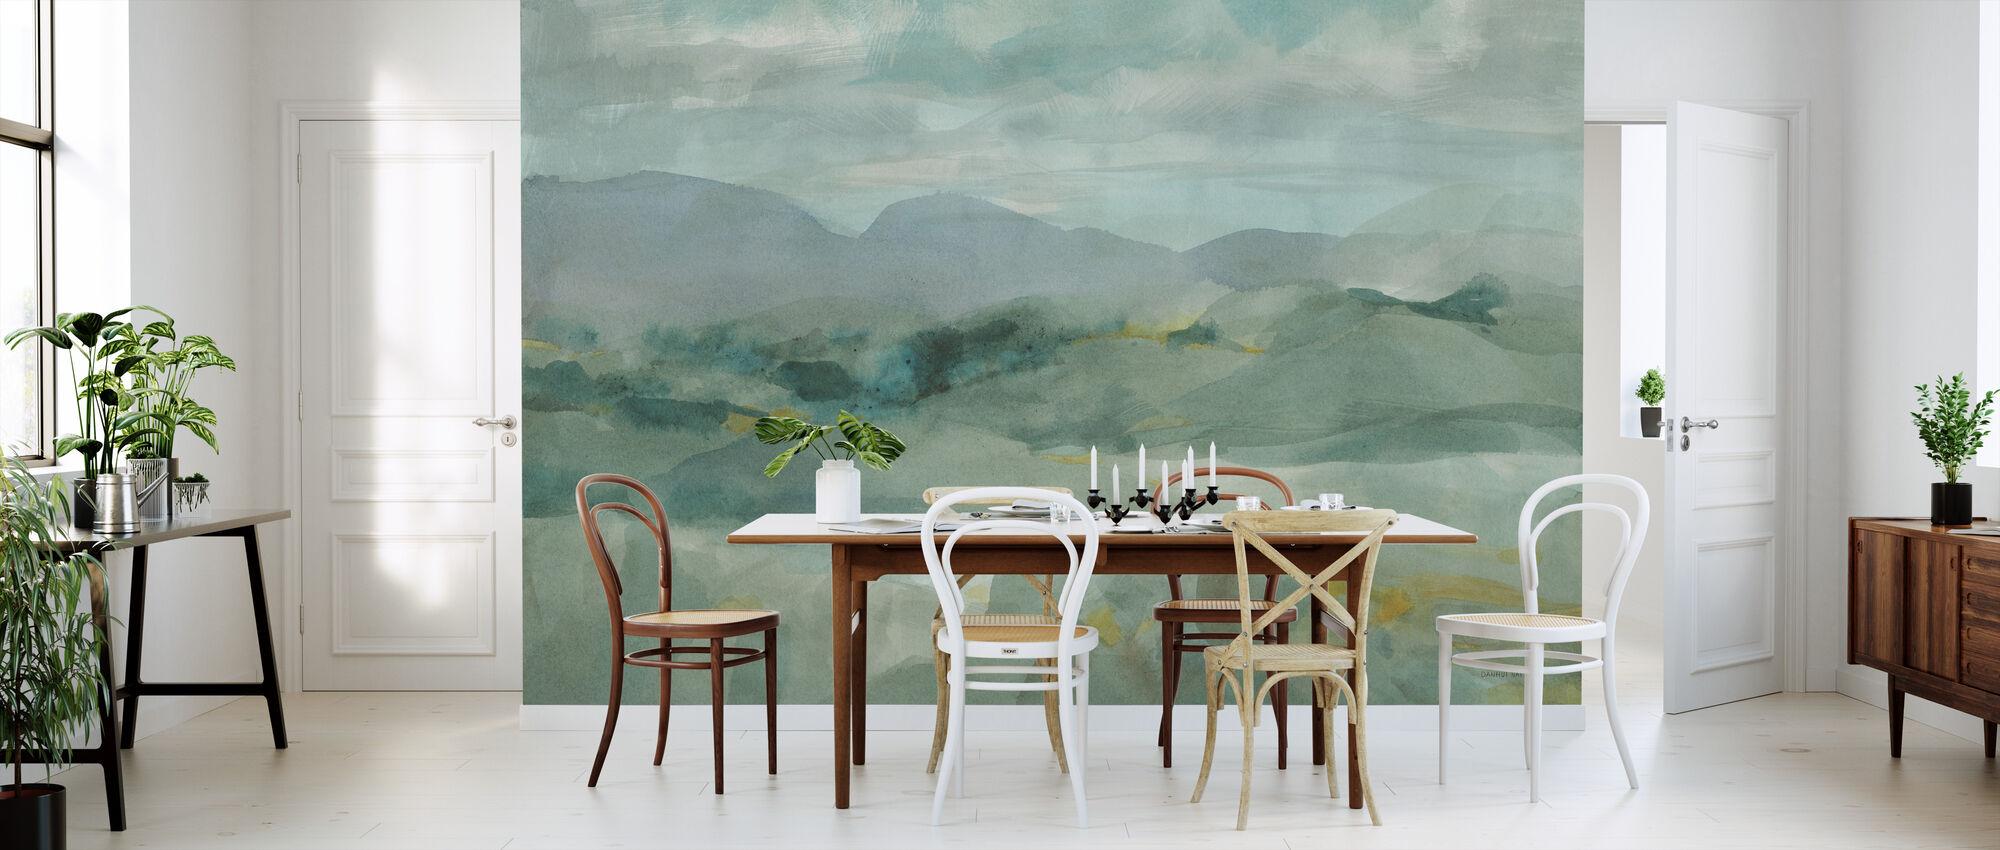 Green Mountain View - Wallpaper - Kitchen